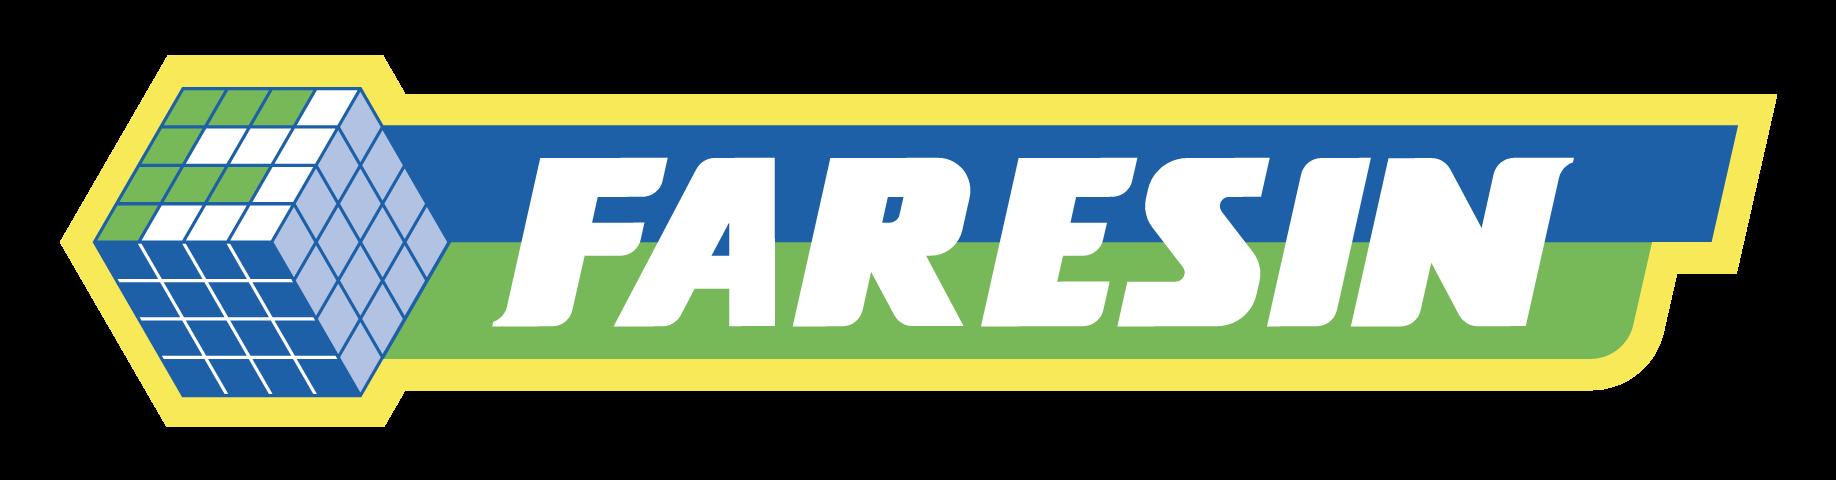 Faresin Industries S.P.A